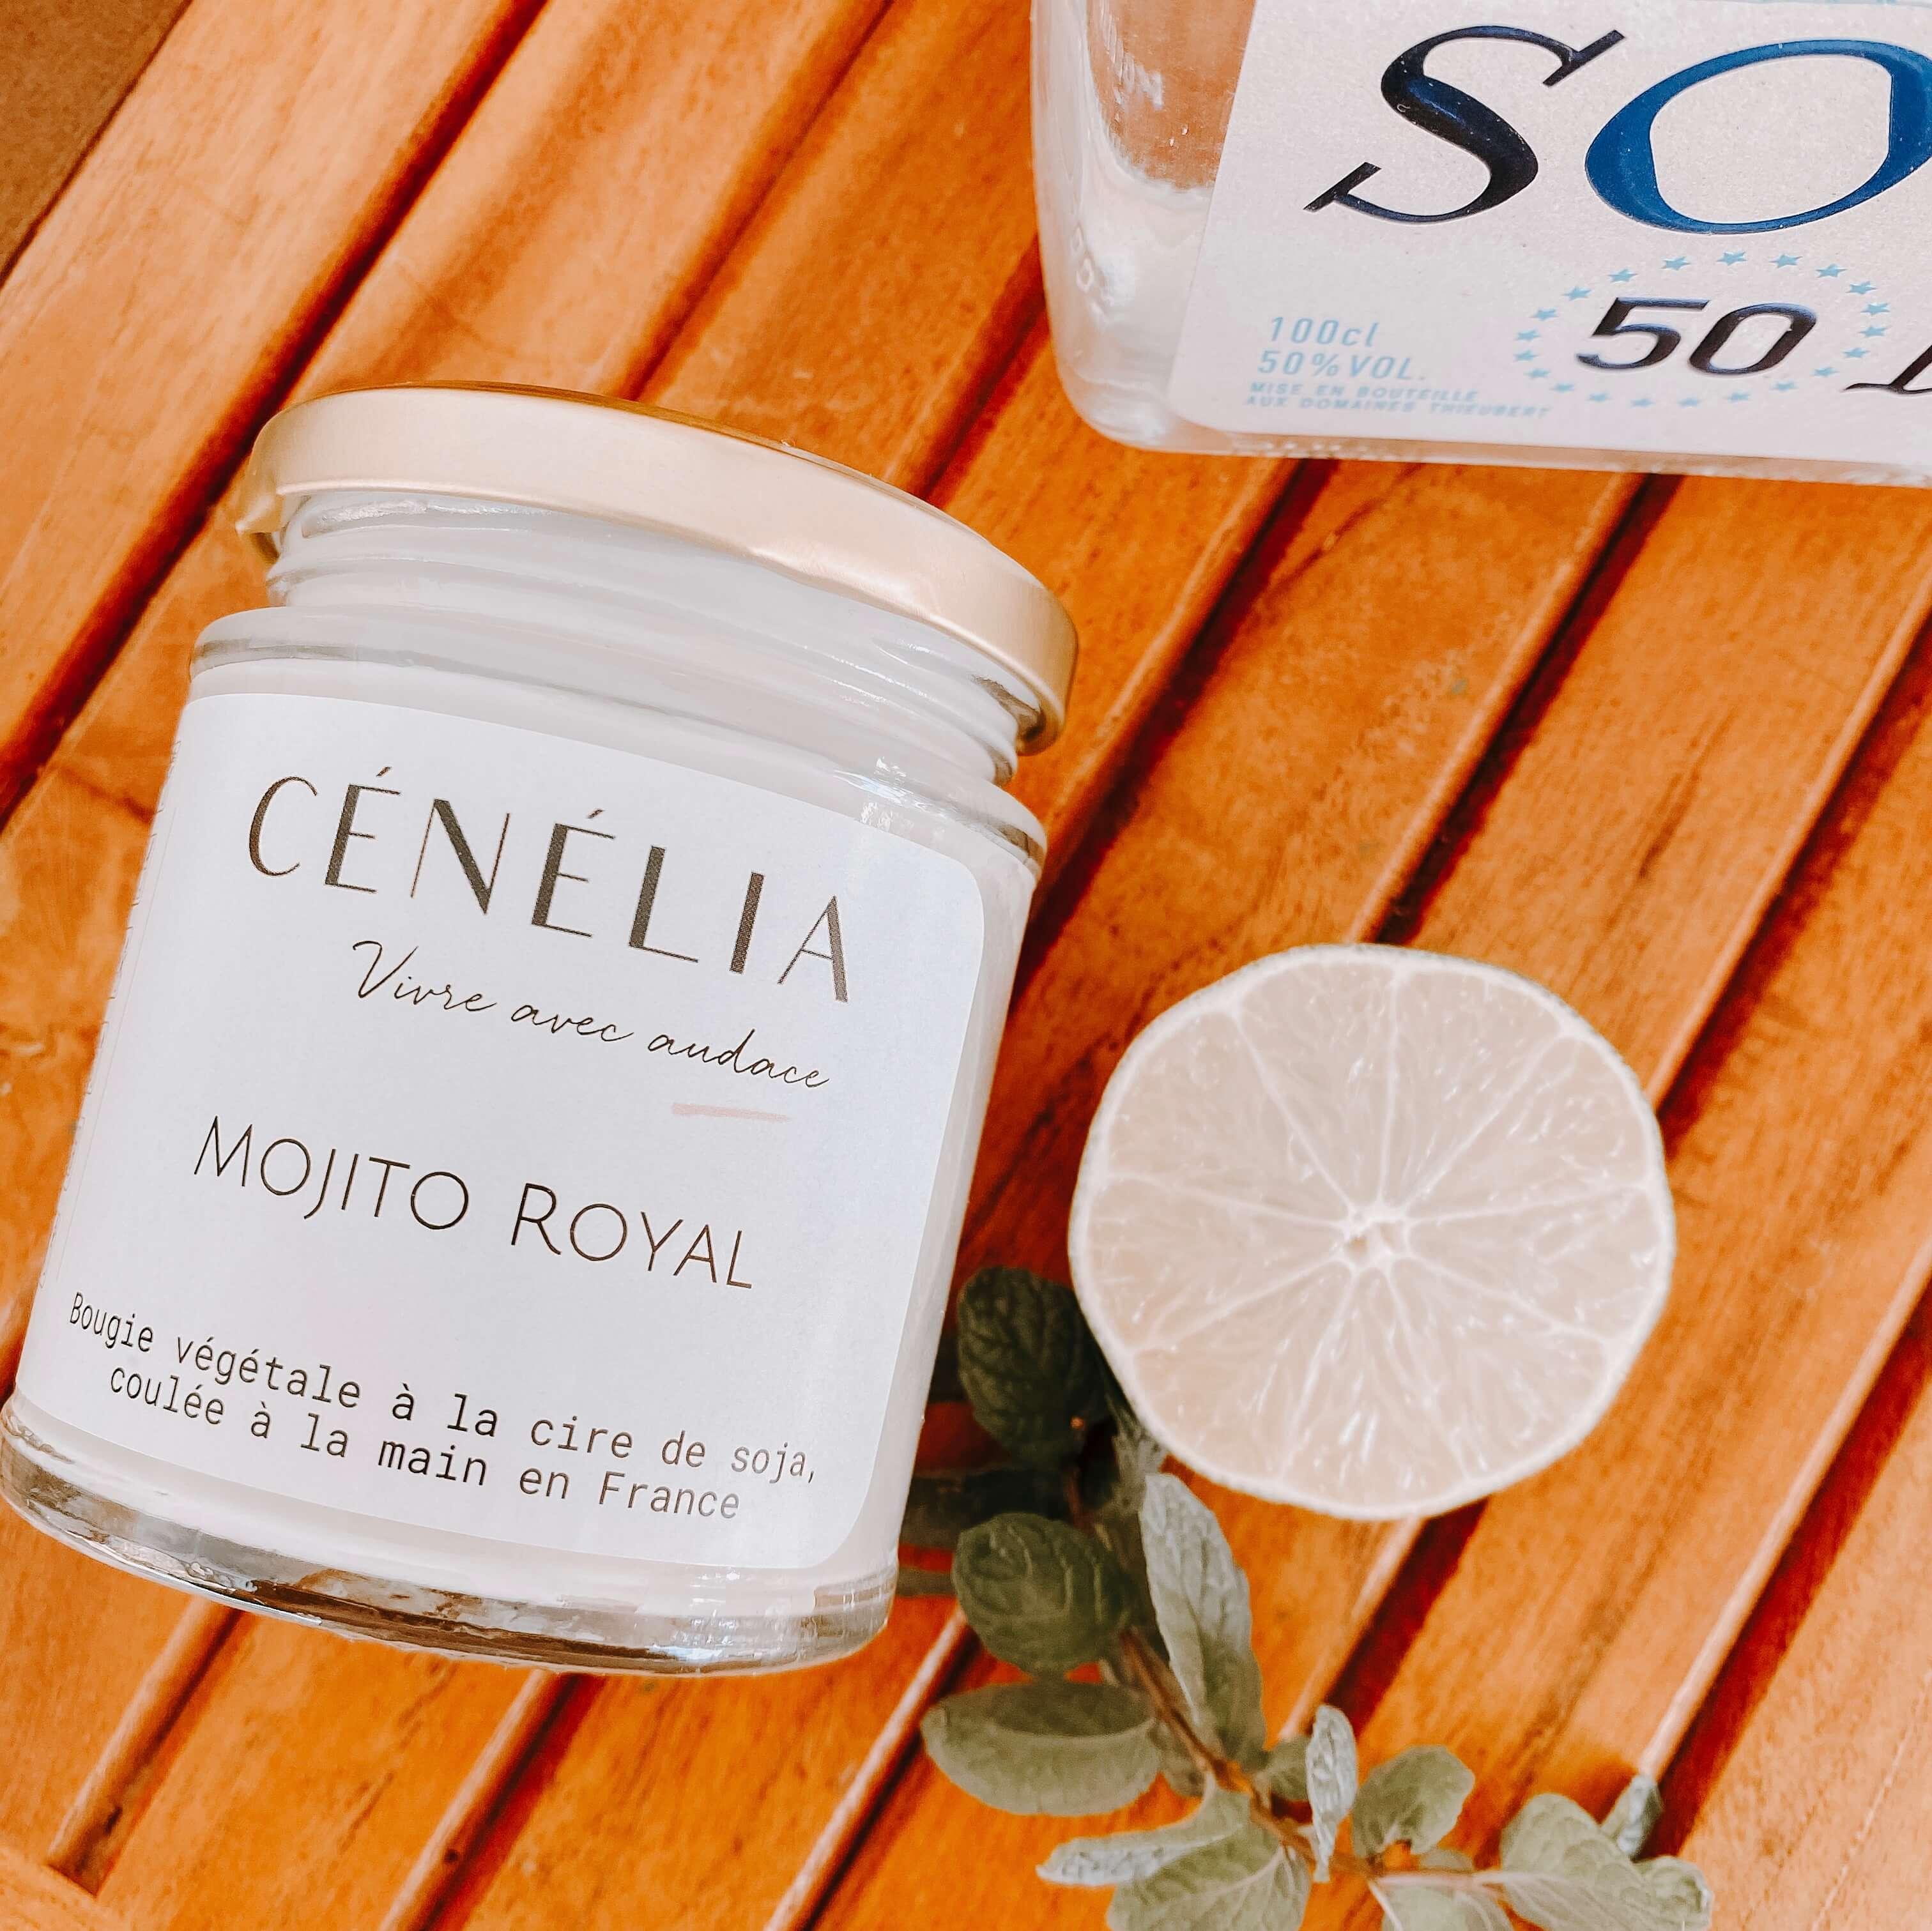 bougie tropicale Mojito Royal - Cénélia